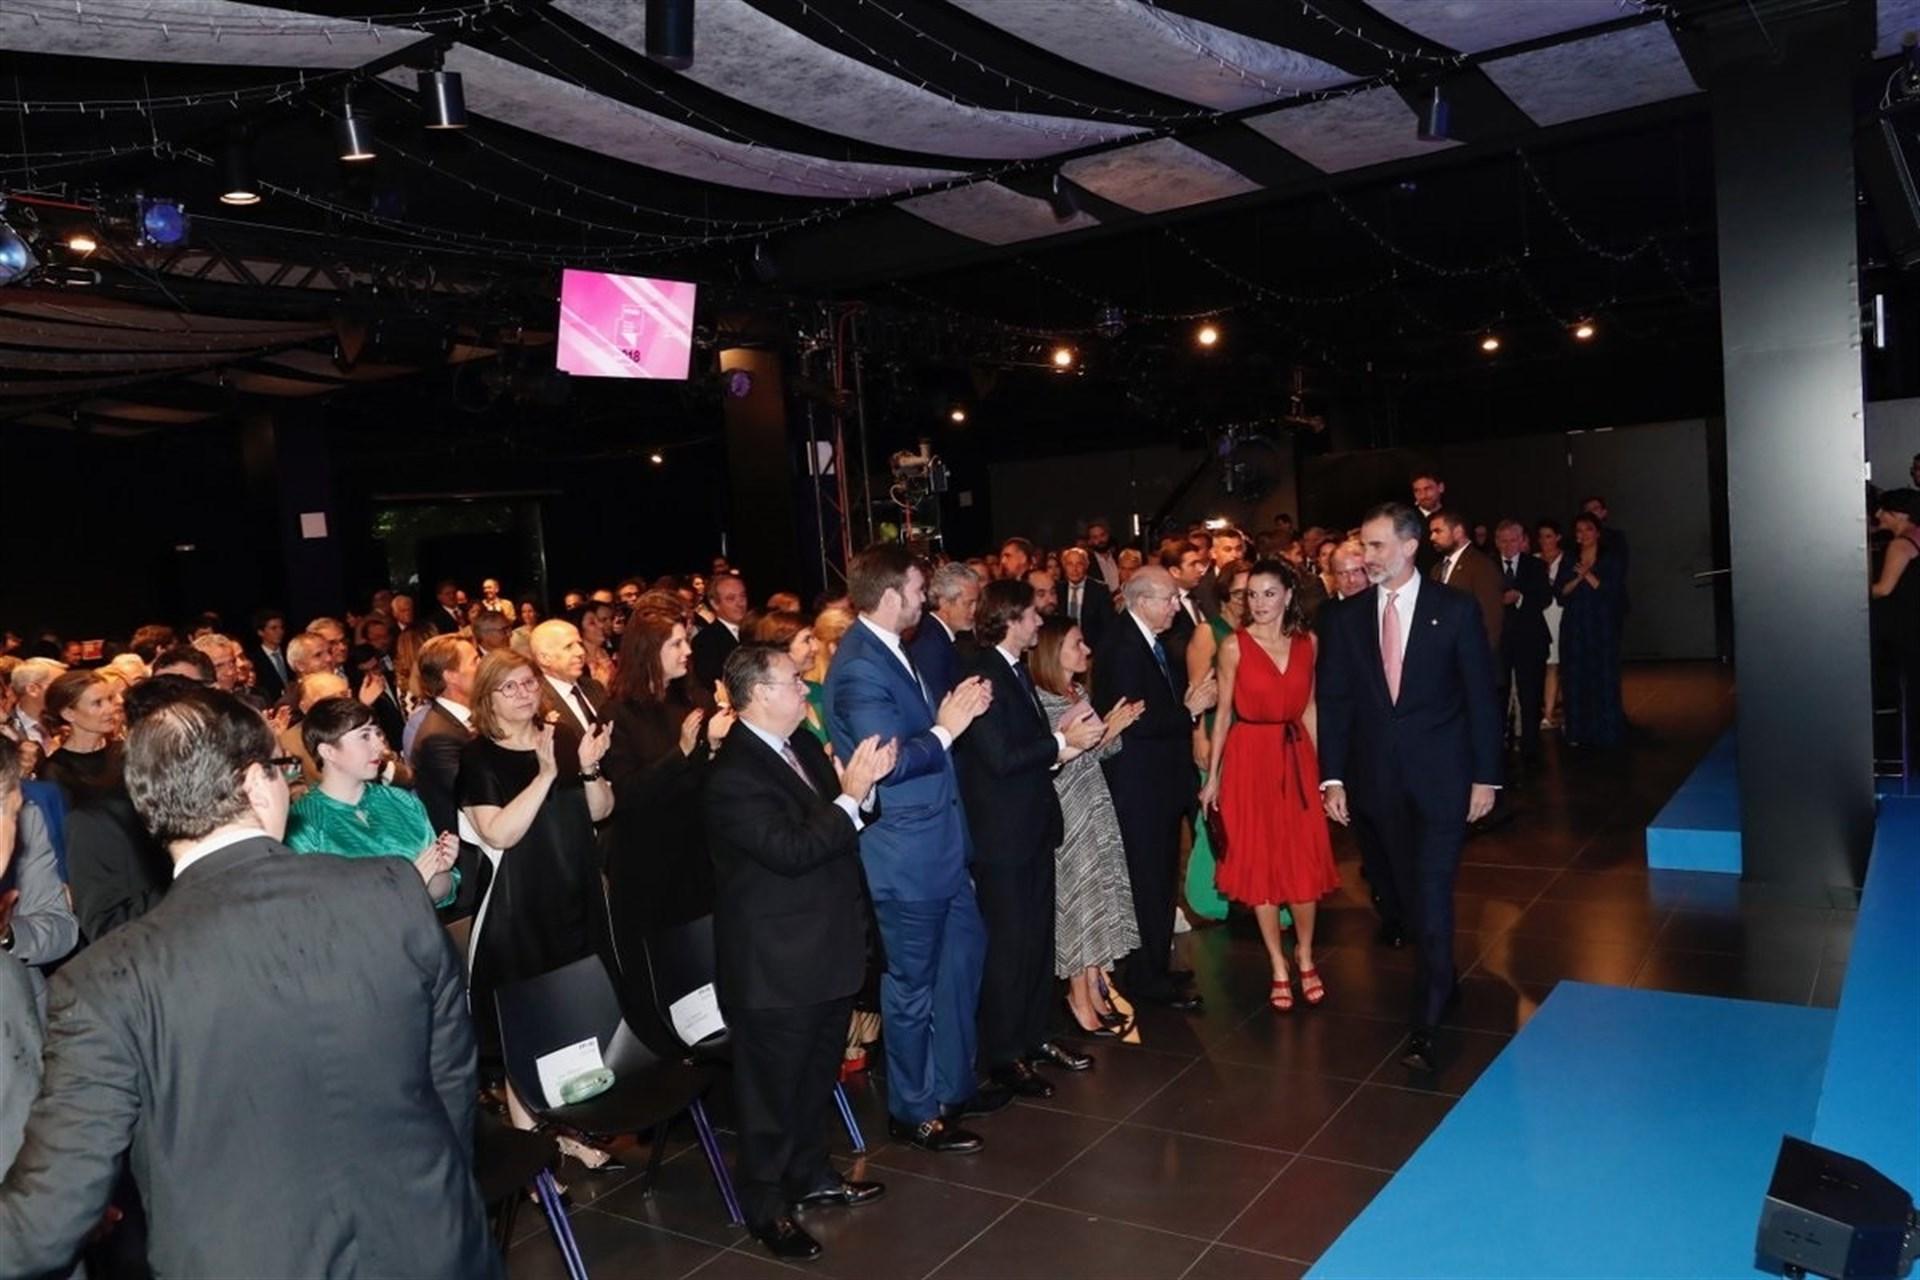 Discurso íntegro de Felipe VI en los Premios Princesa de Girona